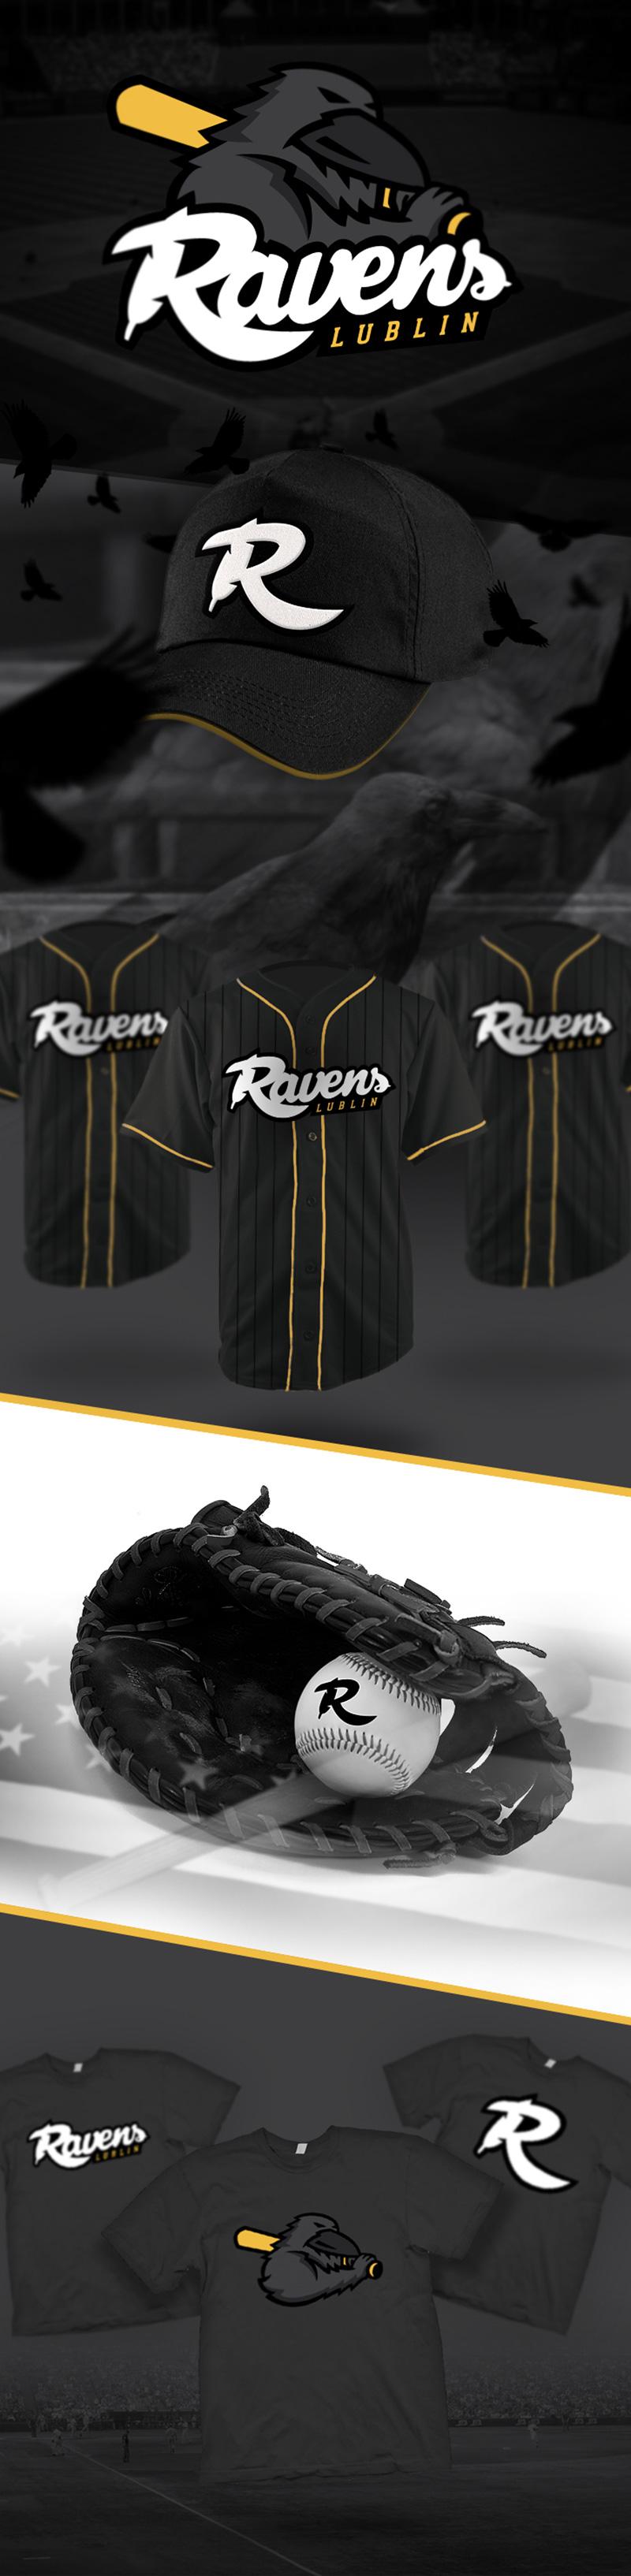 Ravens Lublin - baseball team by Karol Sidorowski